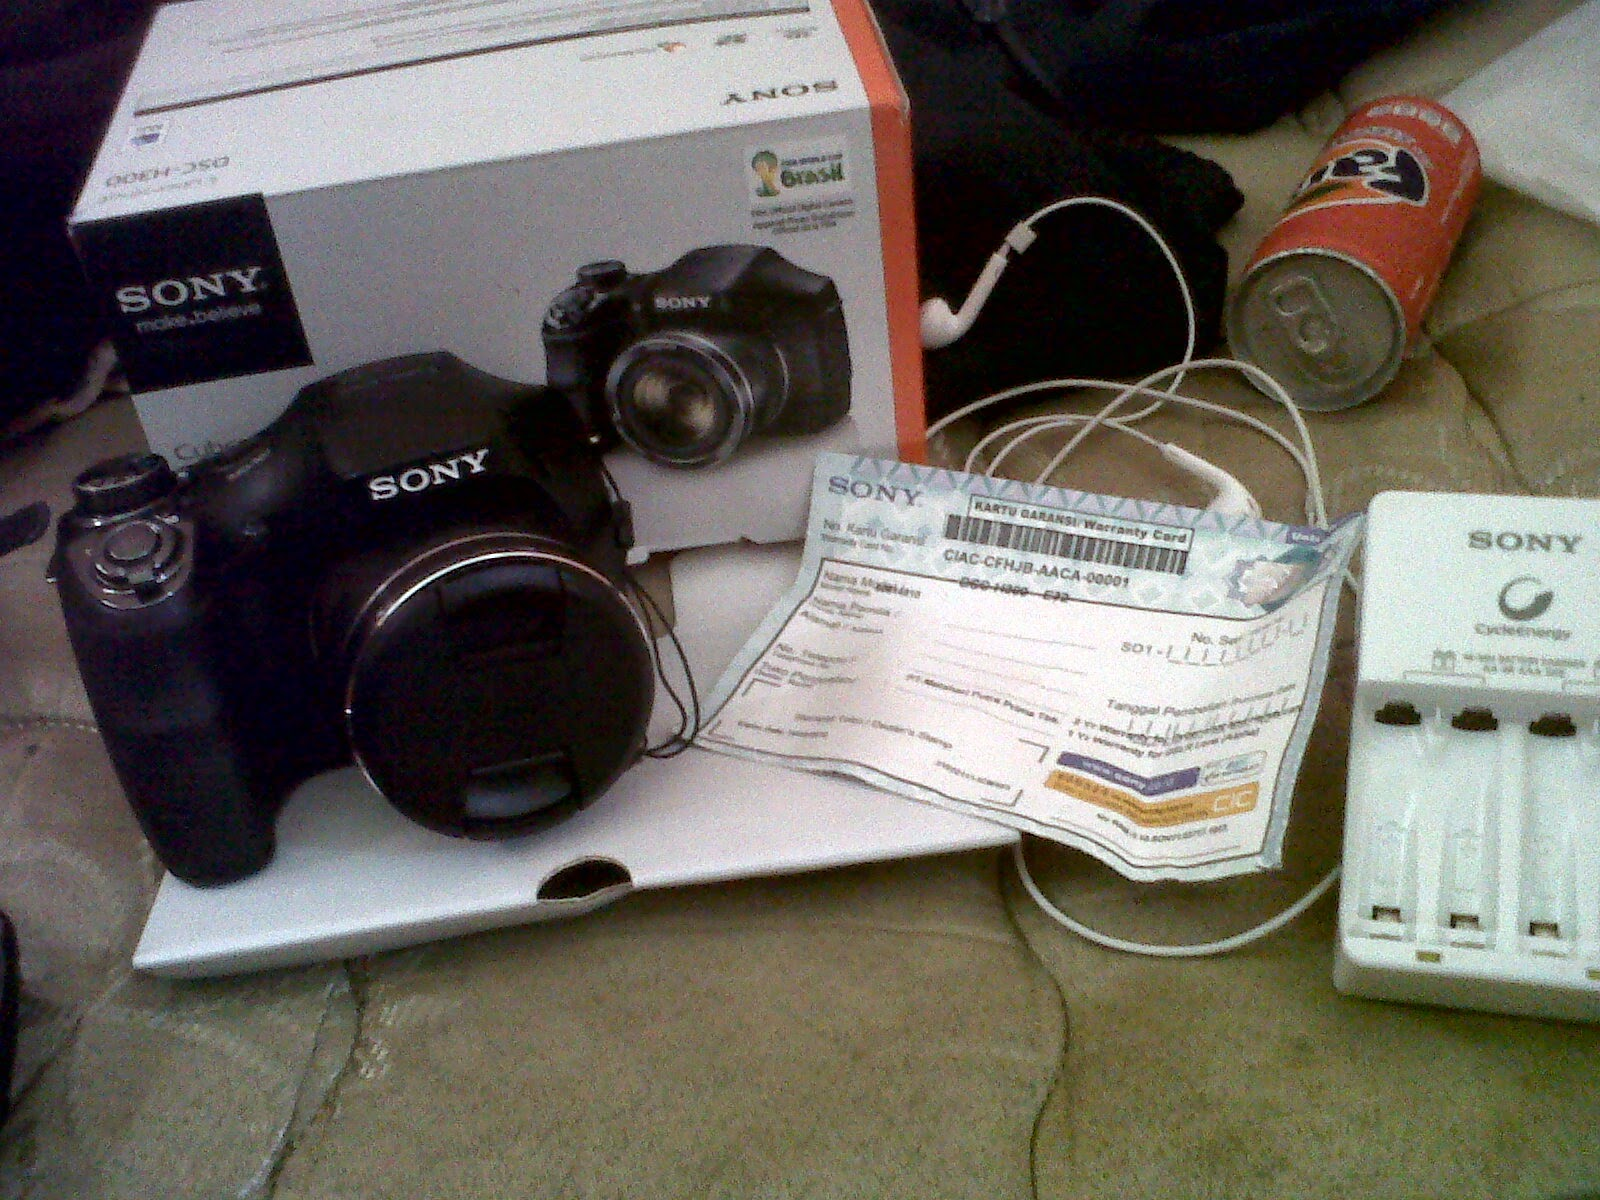 Hasil Foto Kamera Sony Dsc H300 Archidev Camera Prosummer Garansi Resmi Berikut Barang Yang Tadi Saya Beli H 300